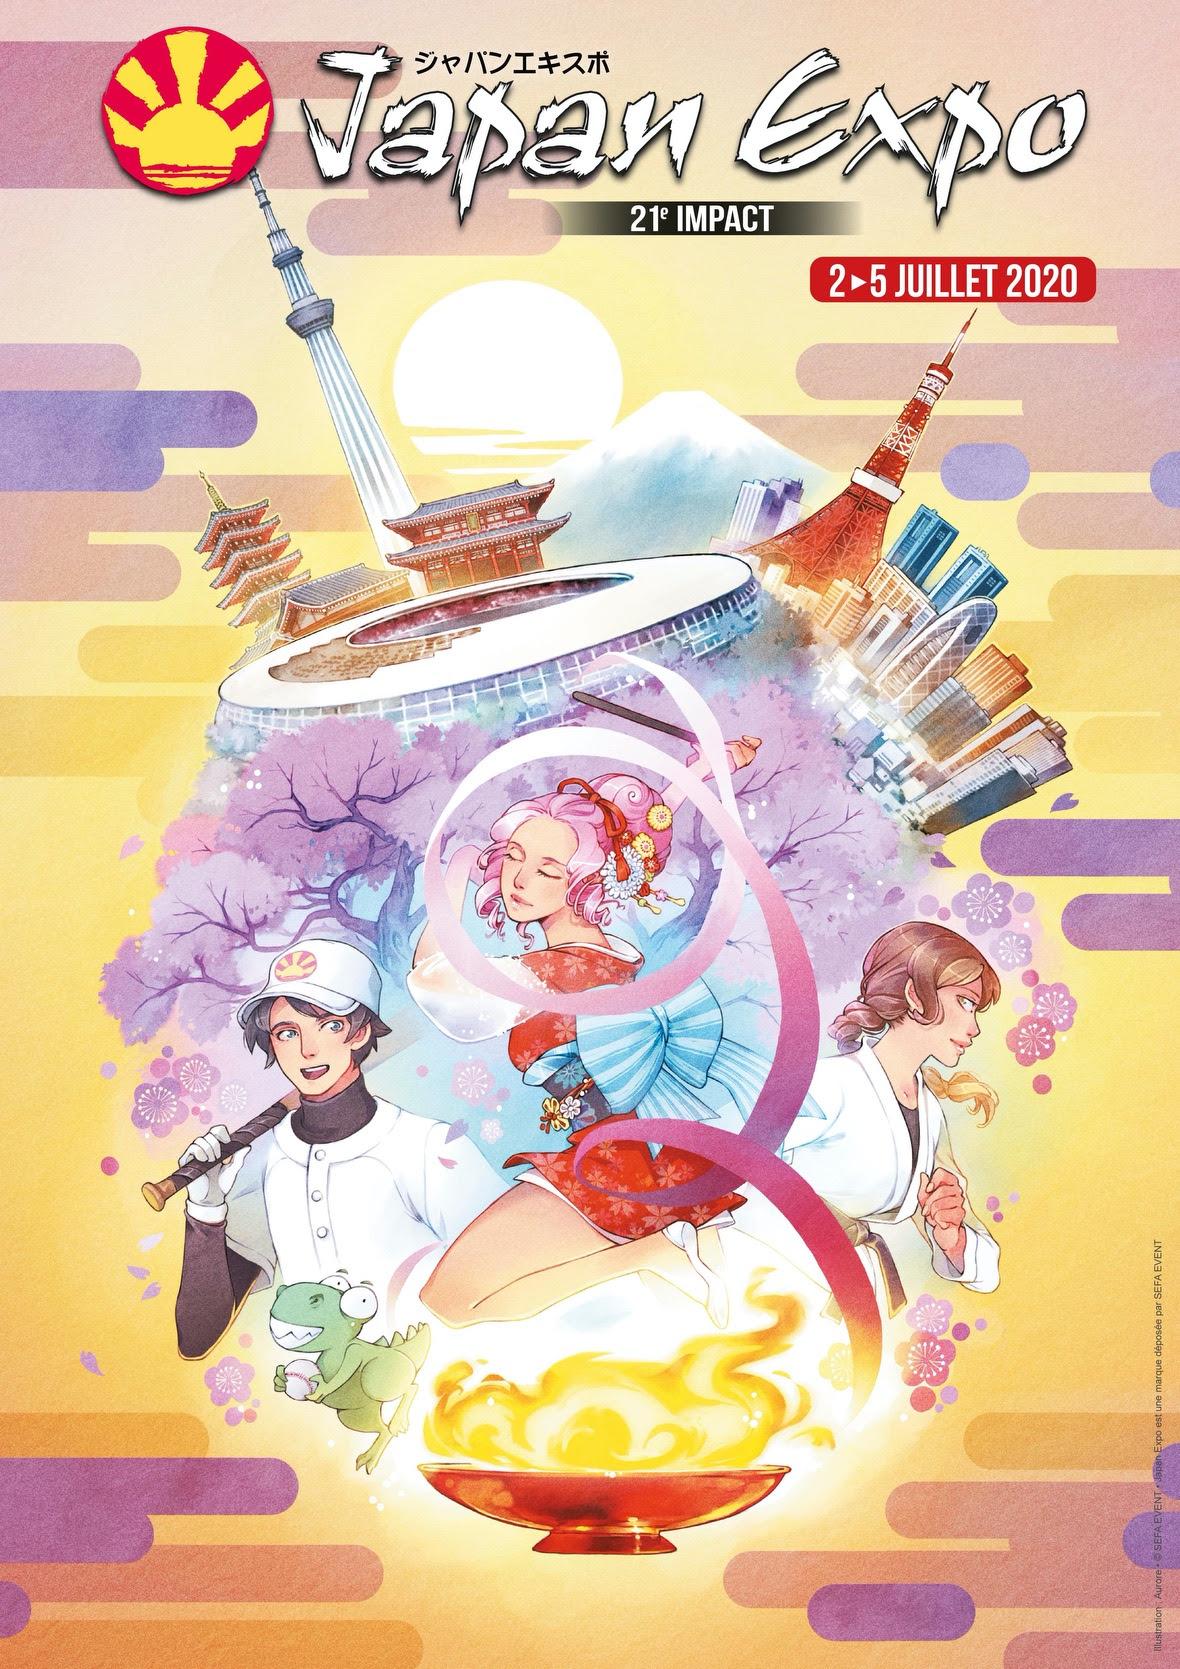 affiche japan expo 2020